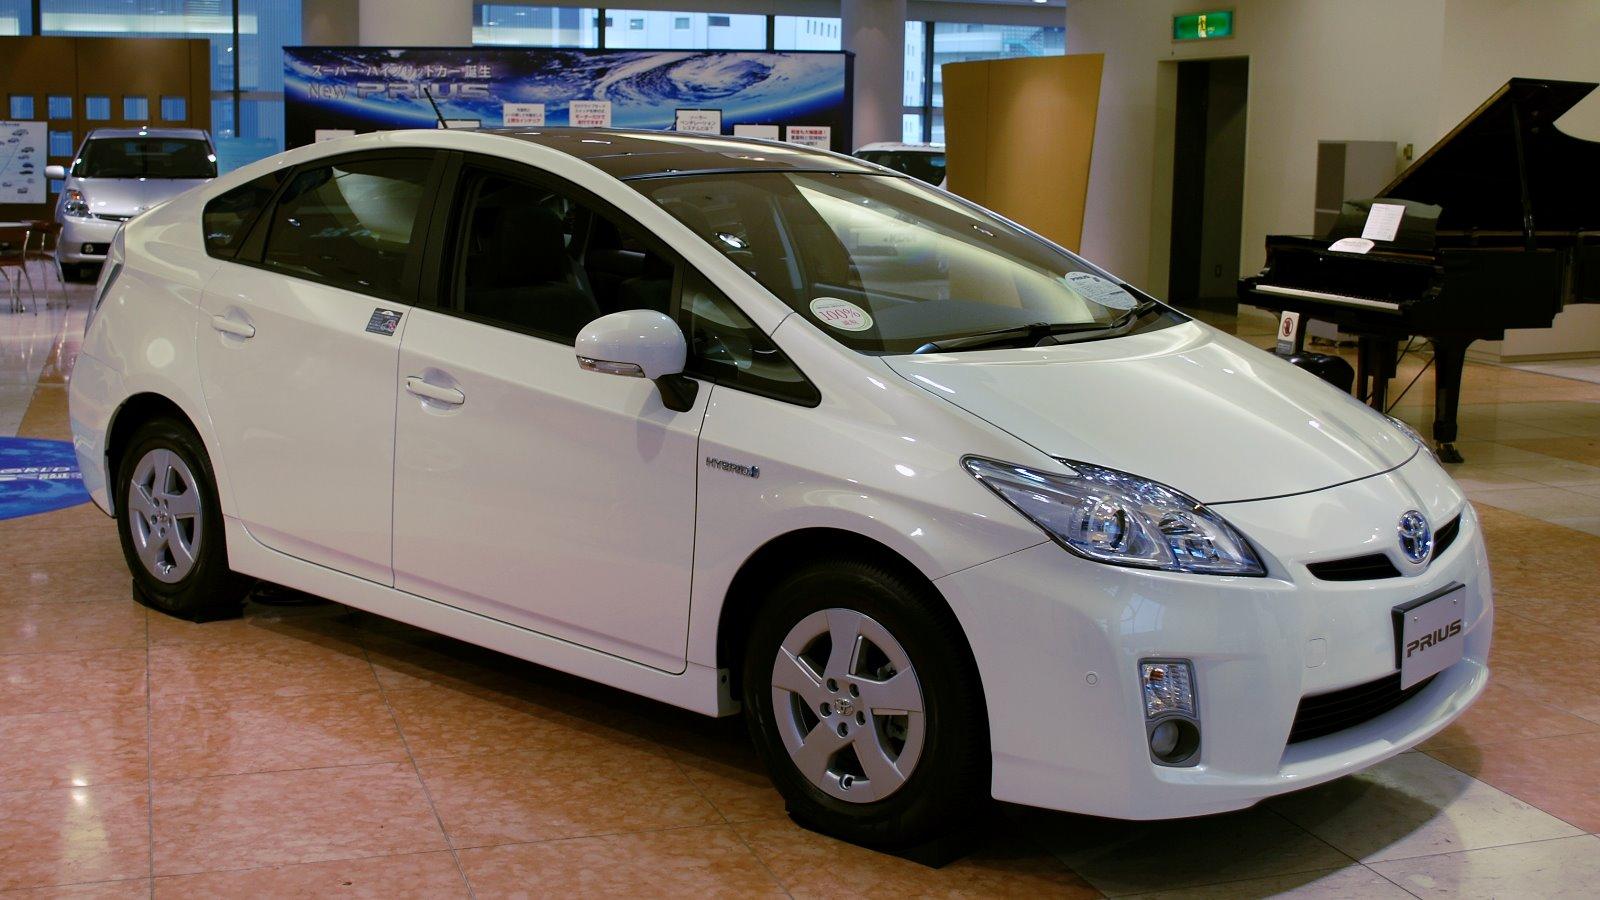 World Of Cars Toyota Prius Image